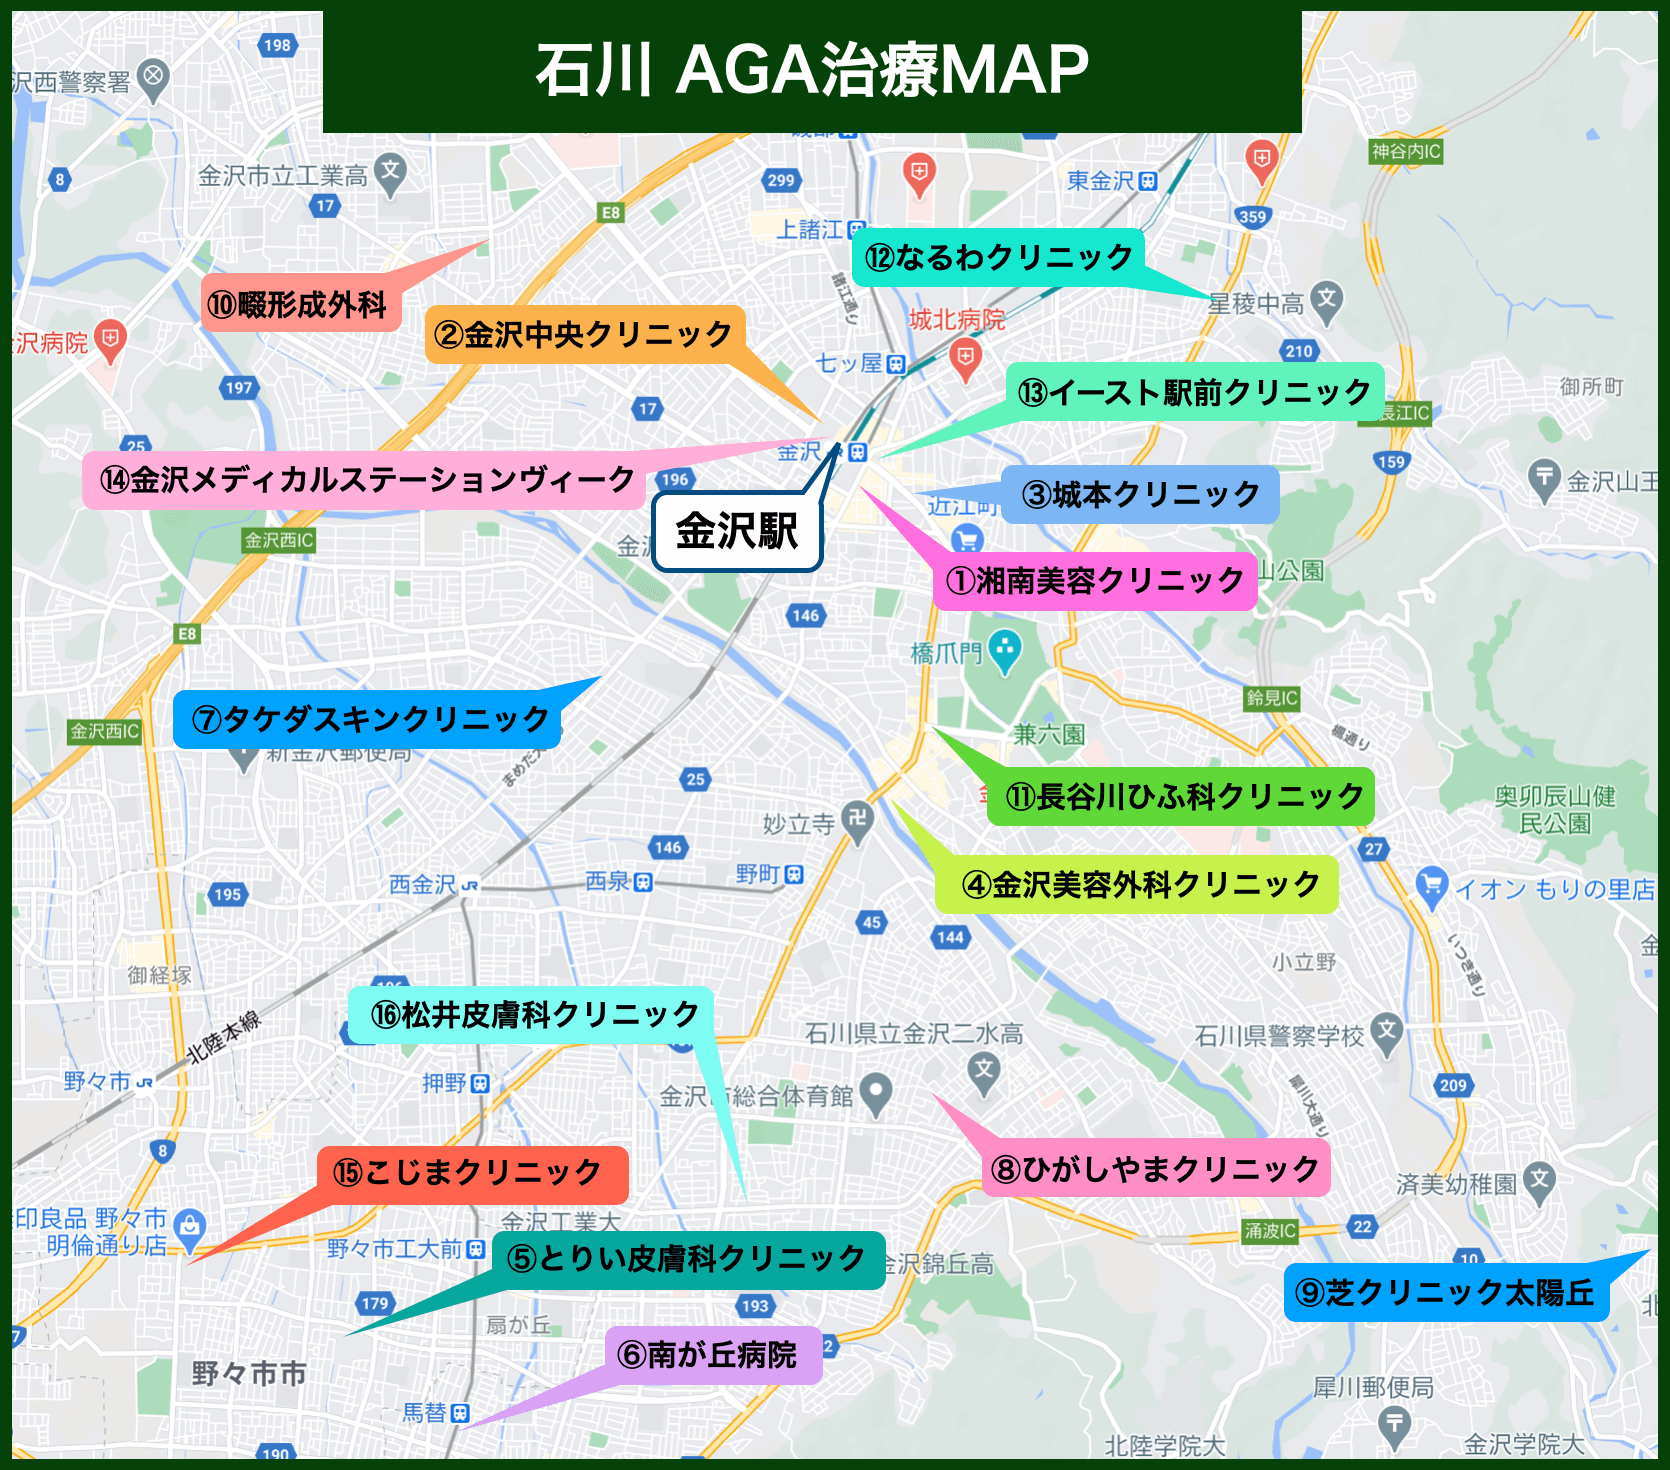 石川 AGA治療MAP